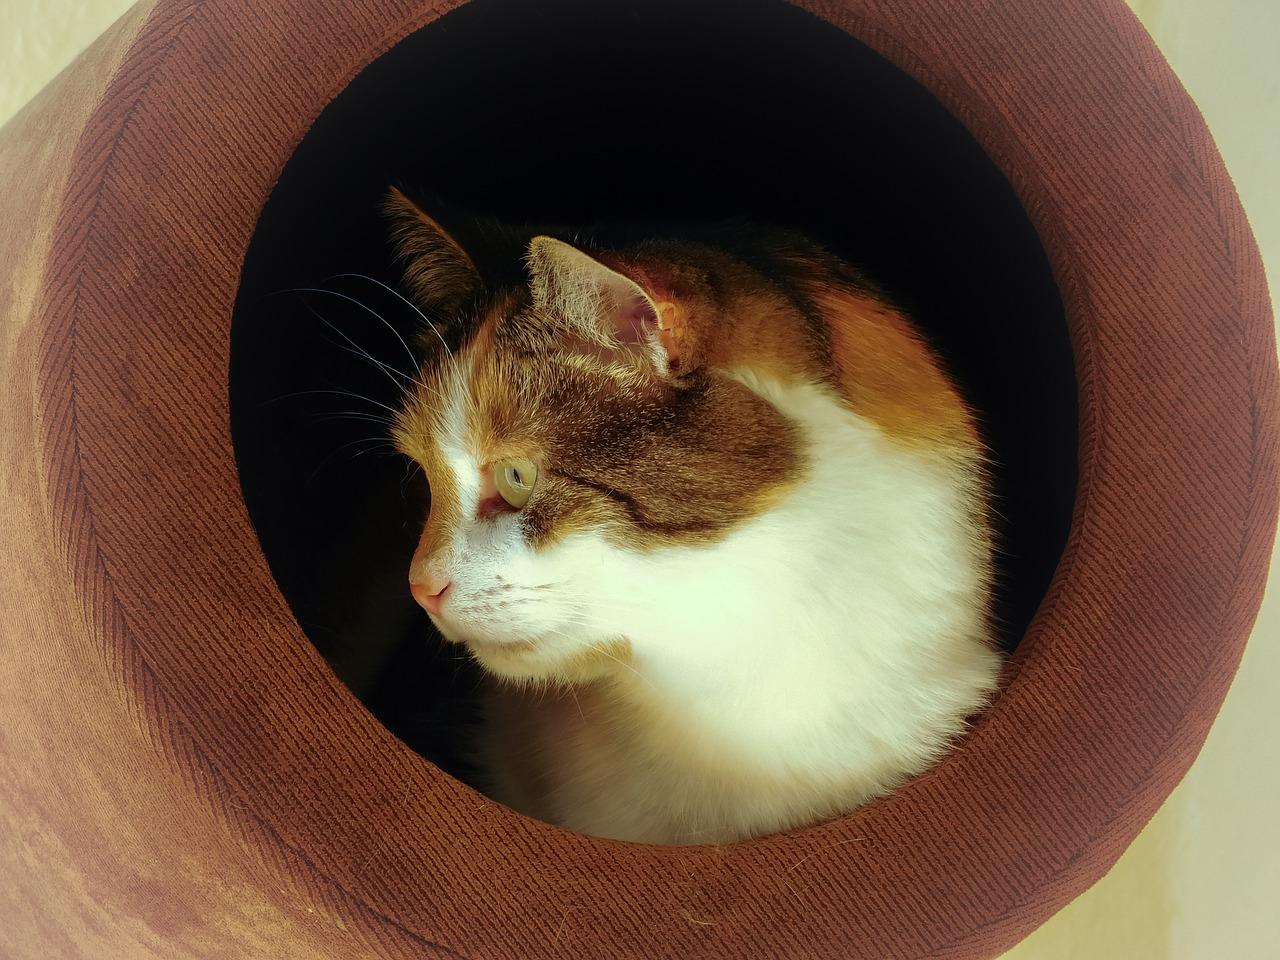 verstecke gegen stress bei katzen interessantes f r katzenfreunde. Black Bedroom Furniture Sets. Home Design Ideas